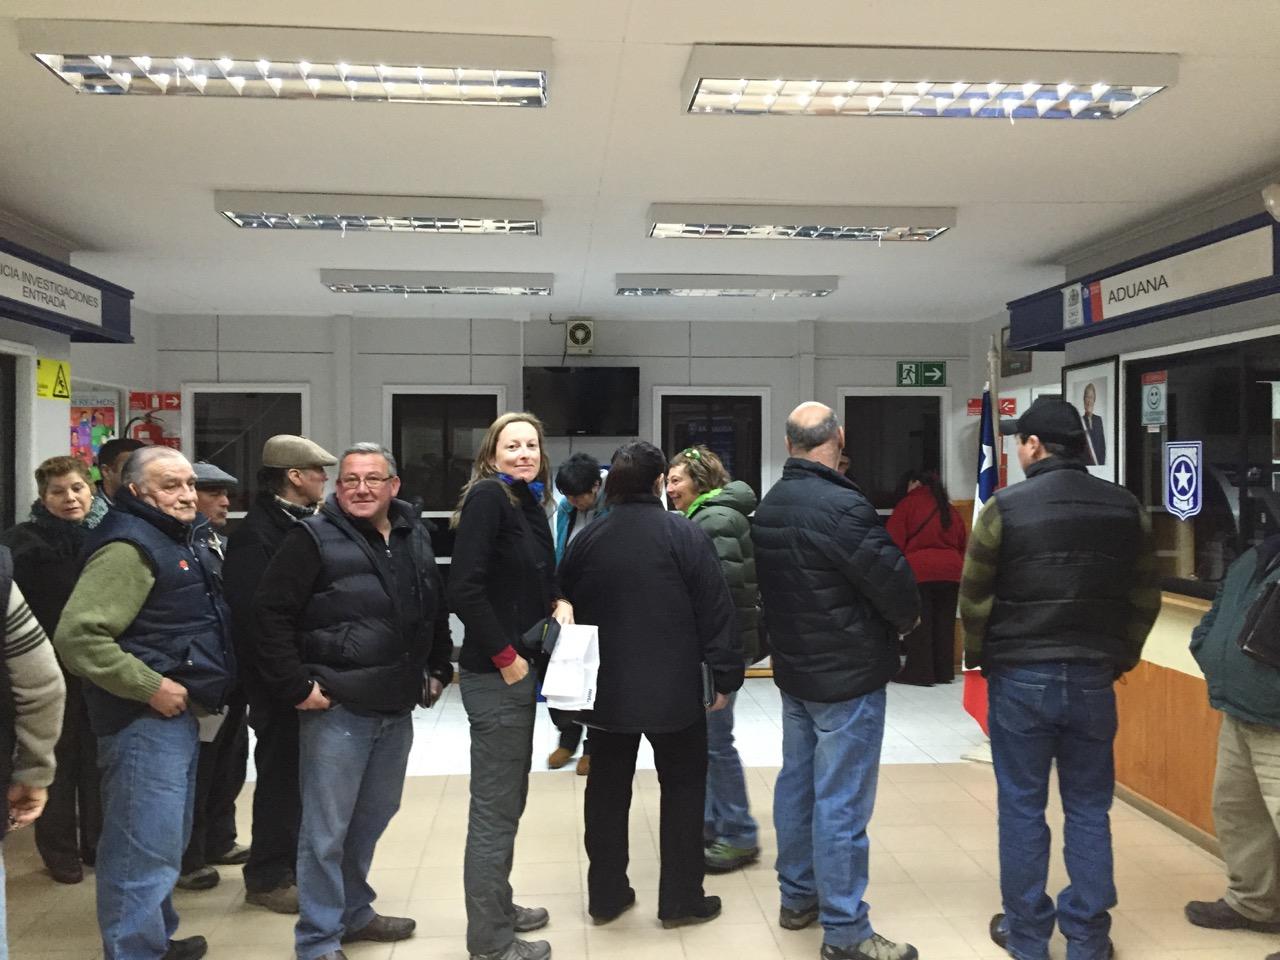 julie_queuing_at_argentina_chile_border.jpg